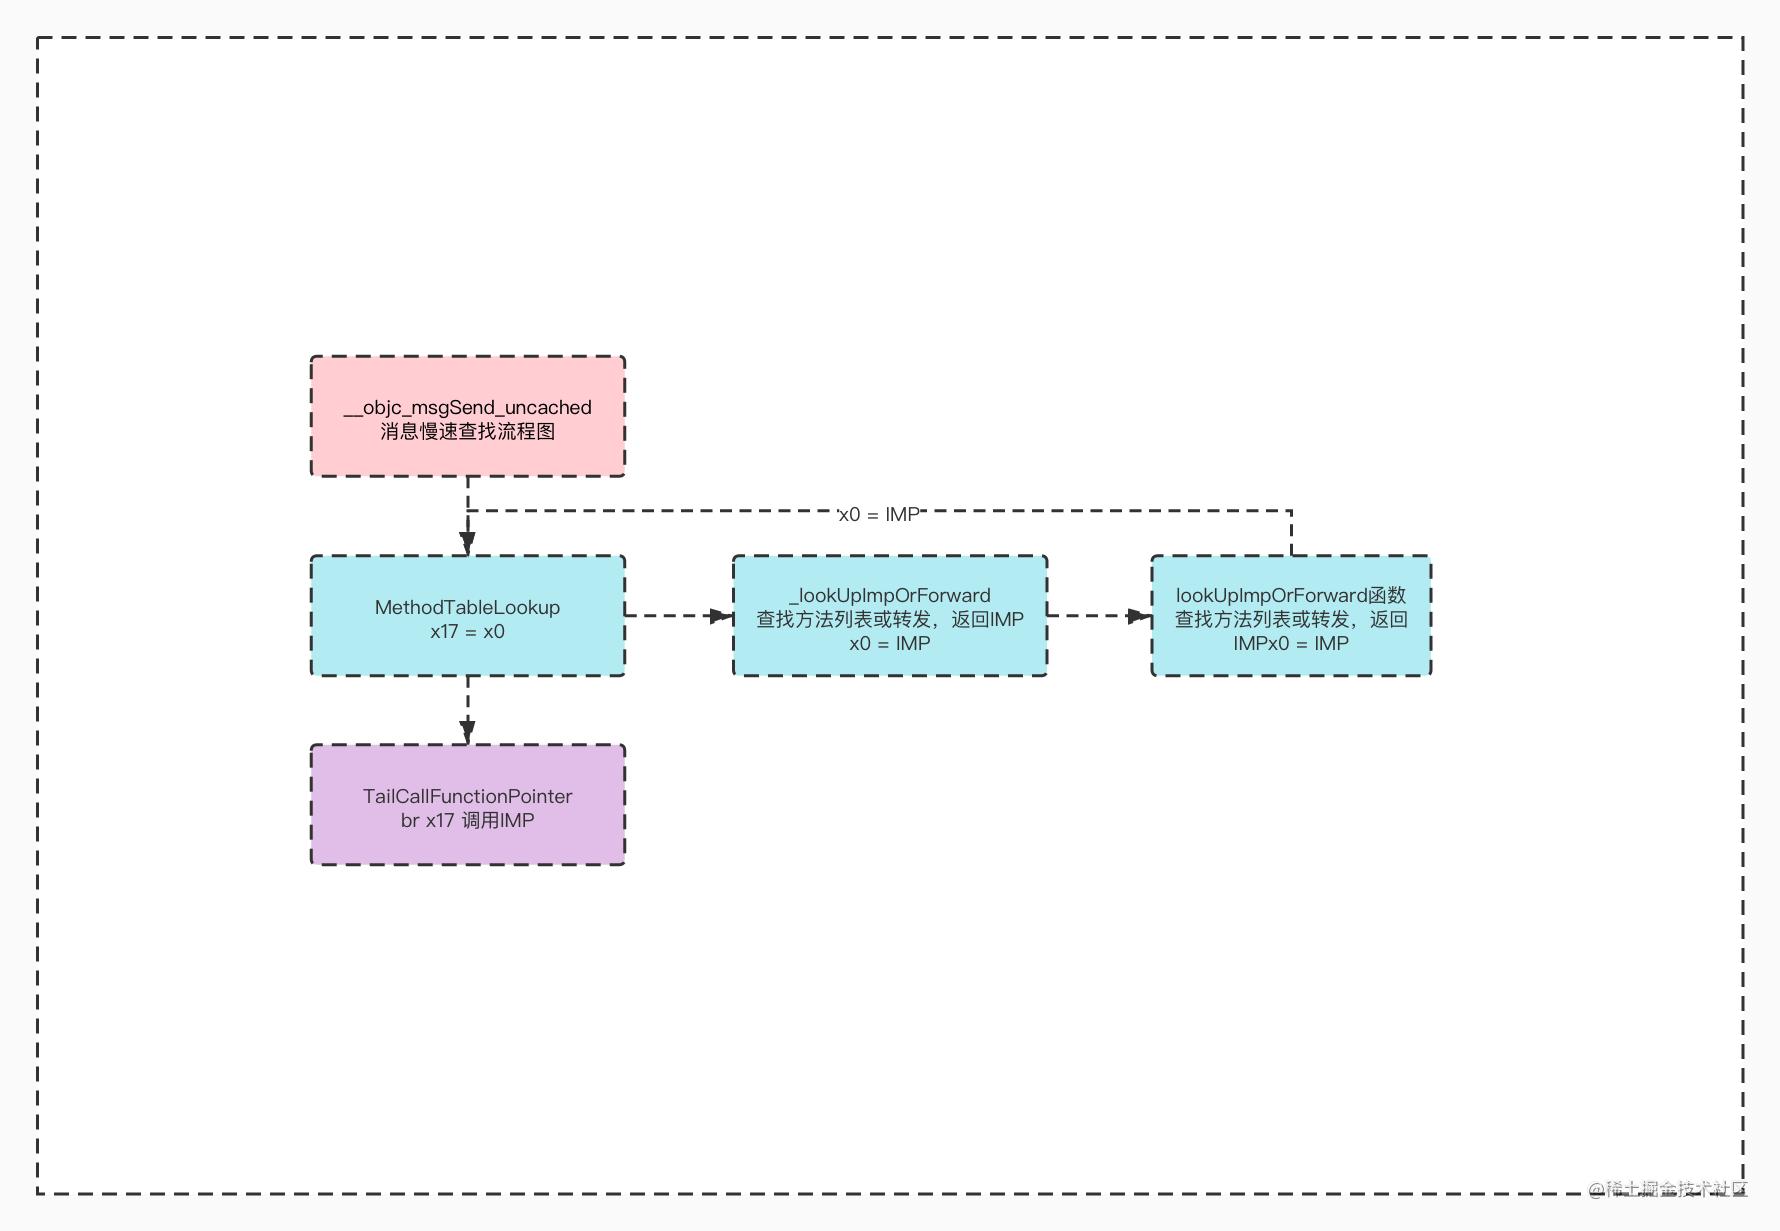 __objc_msgSend_uncached流程图.jpg